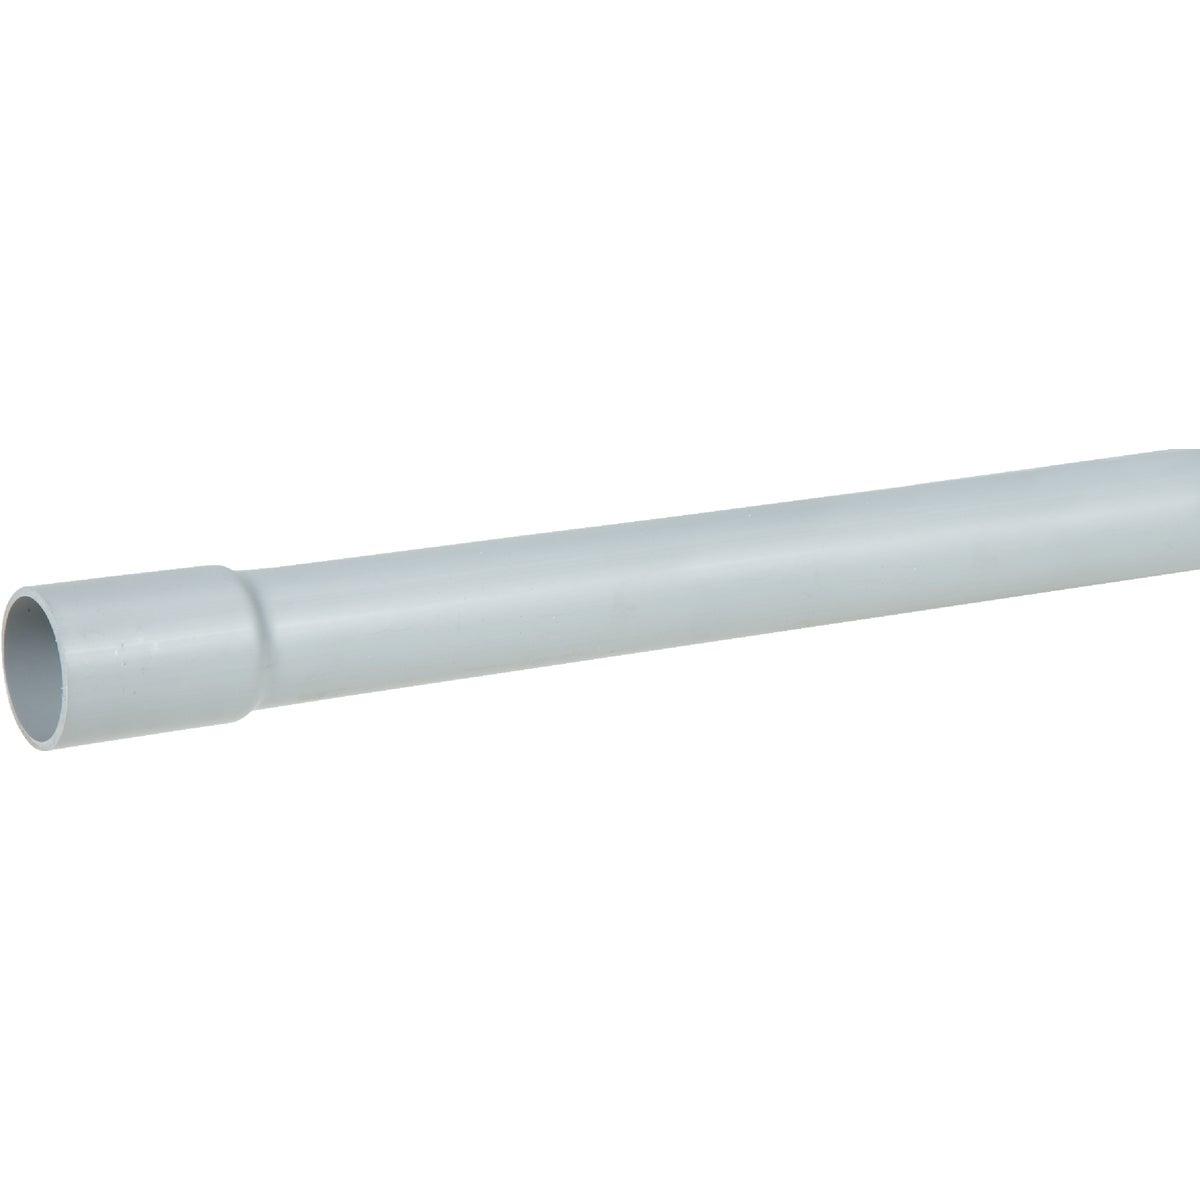 Allied 1-1/4 In. x 10 Ft. Schedule 80 PVC Conduit